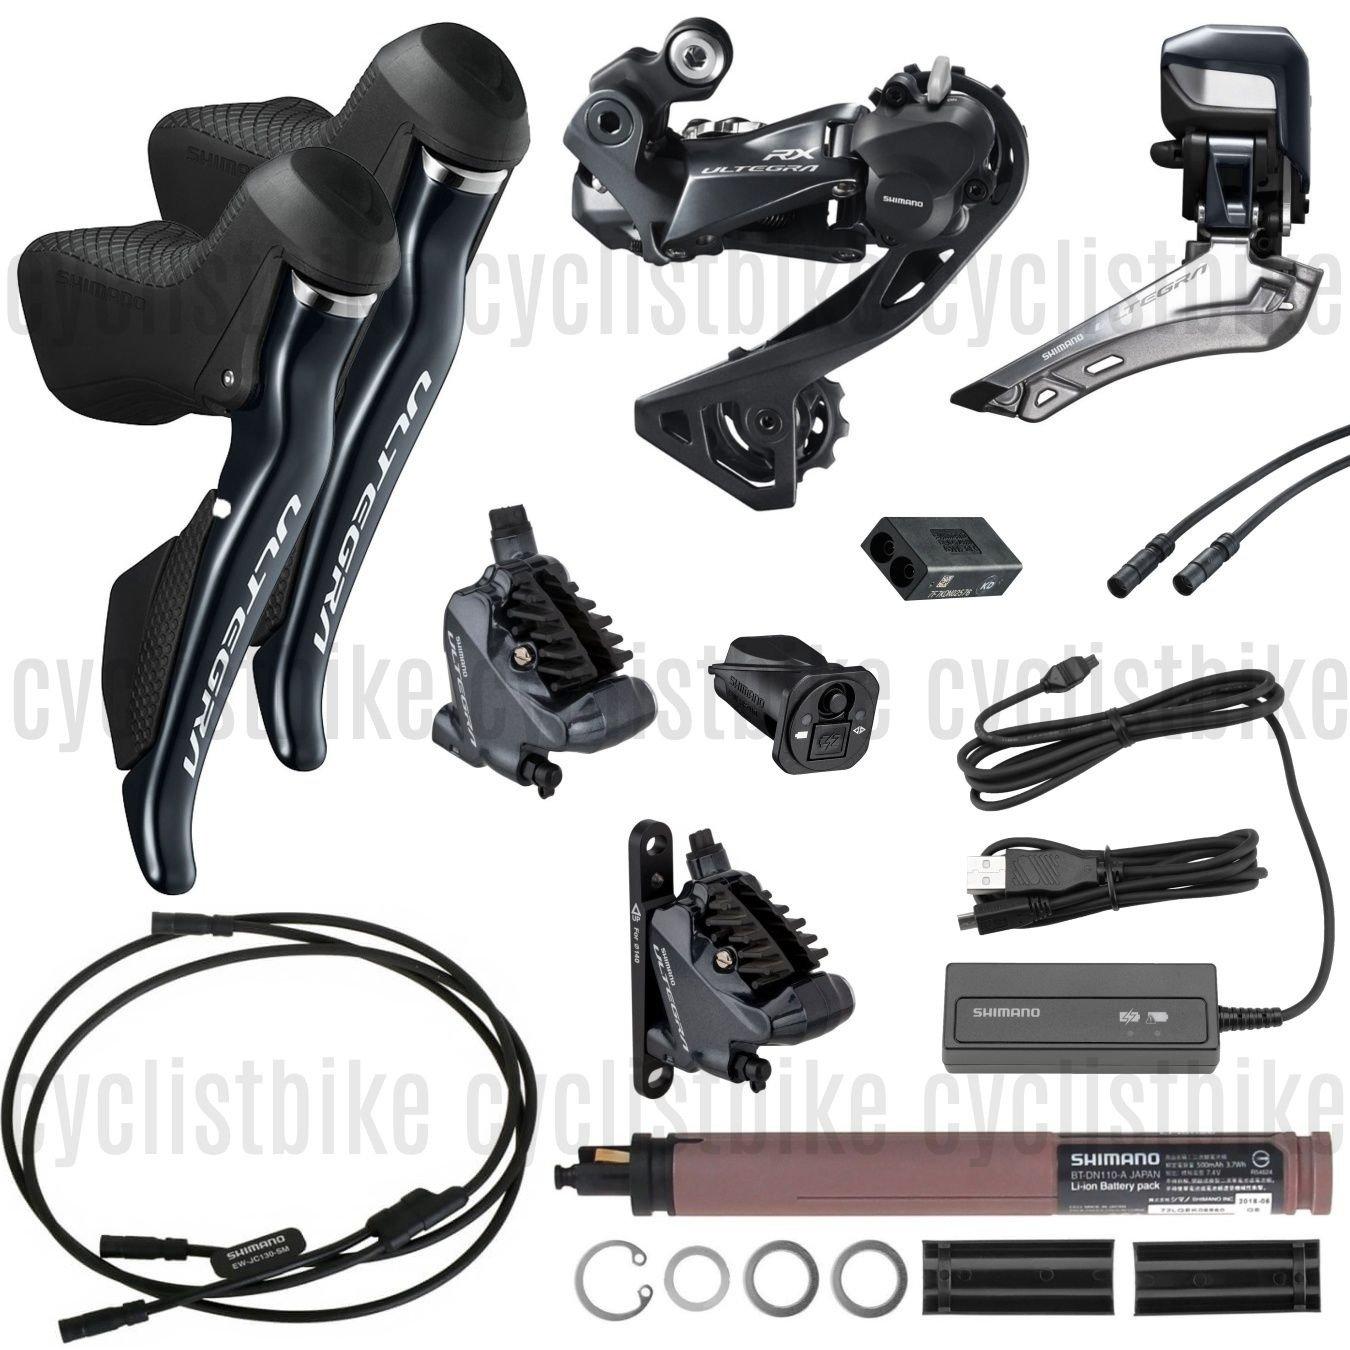 R8050 DI2 Electric Hydraulic Brakes Upgrade Groupset Kit Shimano Ultegra R8070